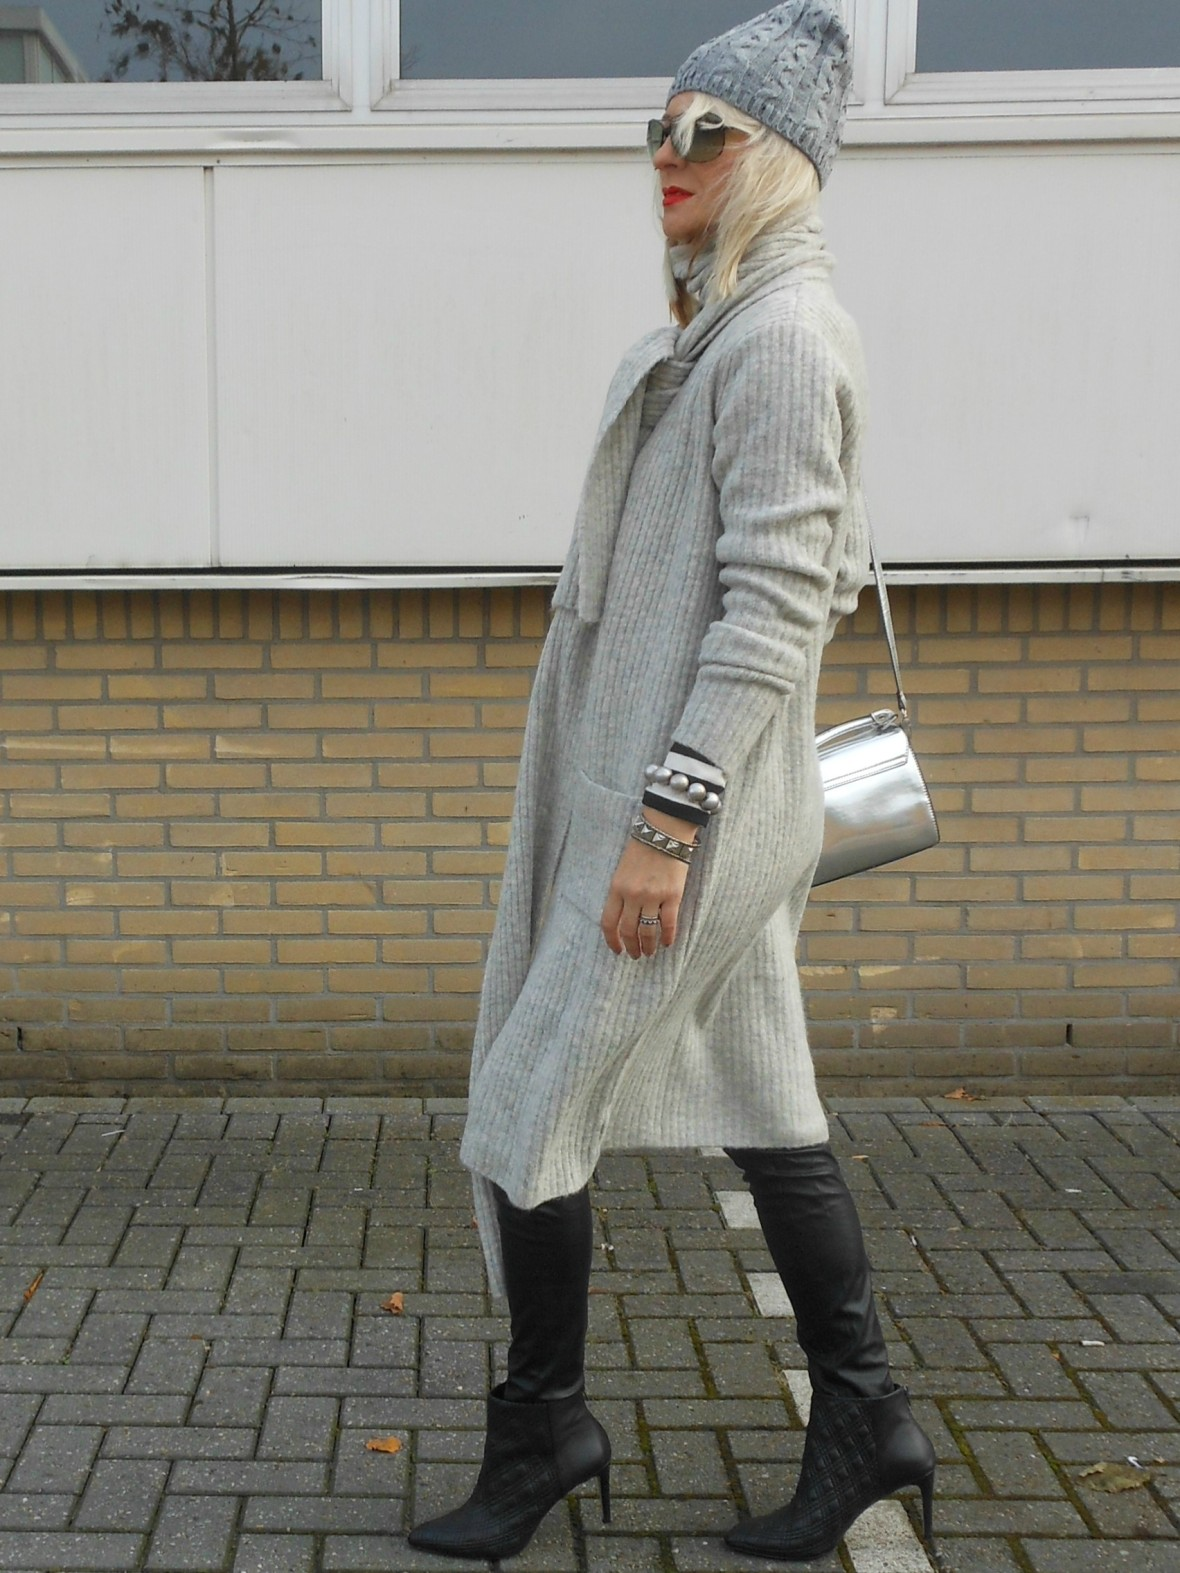 Dutch fashion blogger, Dutch style blogger, Romanian fashion blogger, Romanian style blogger